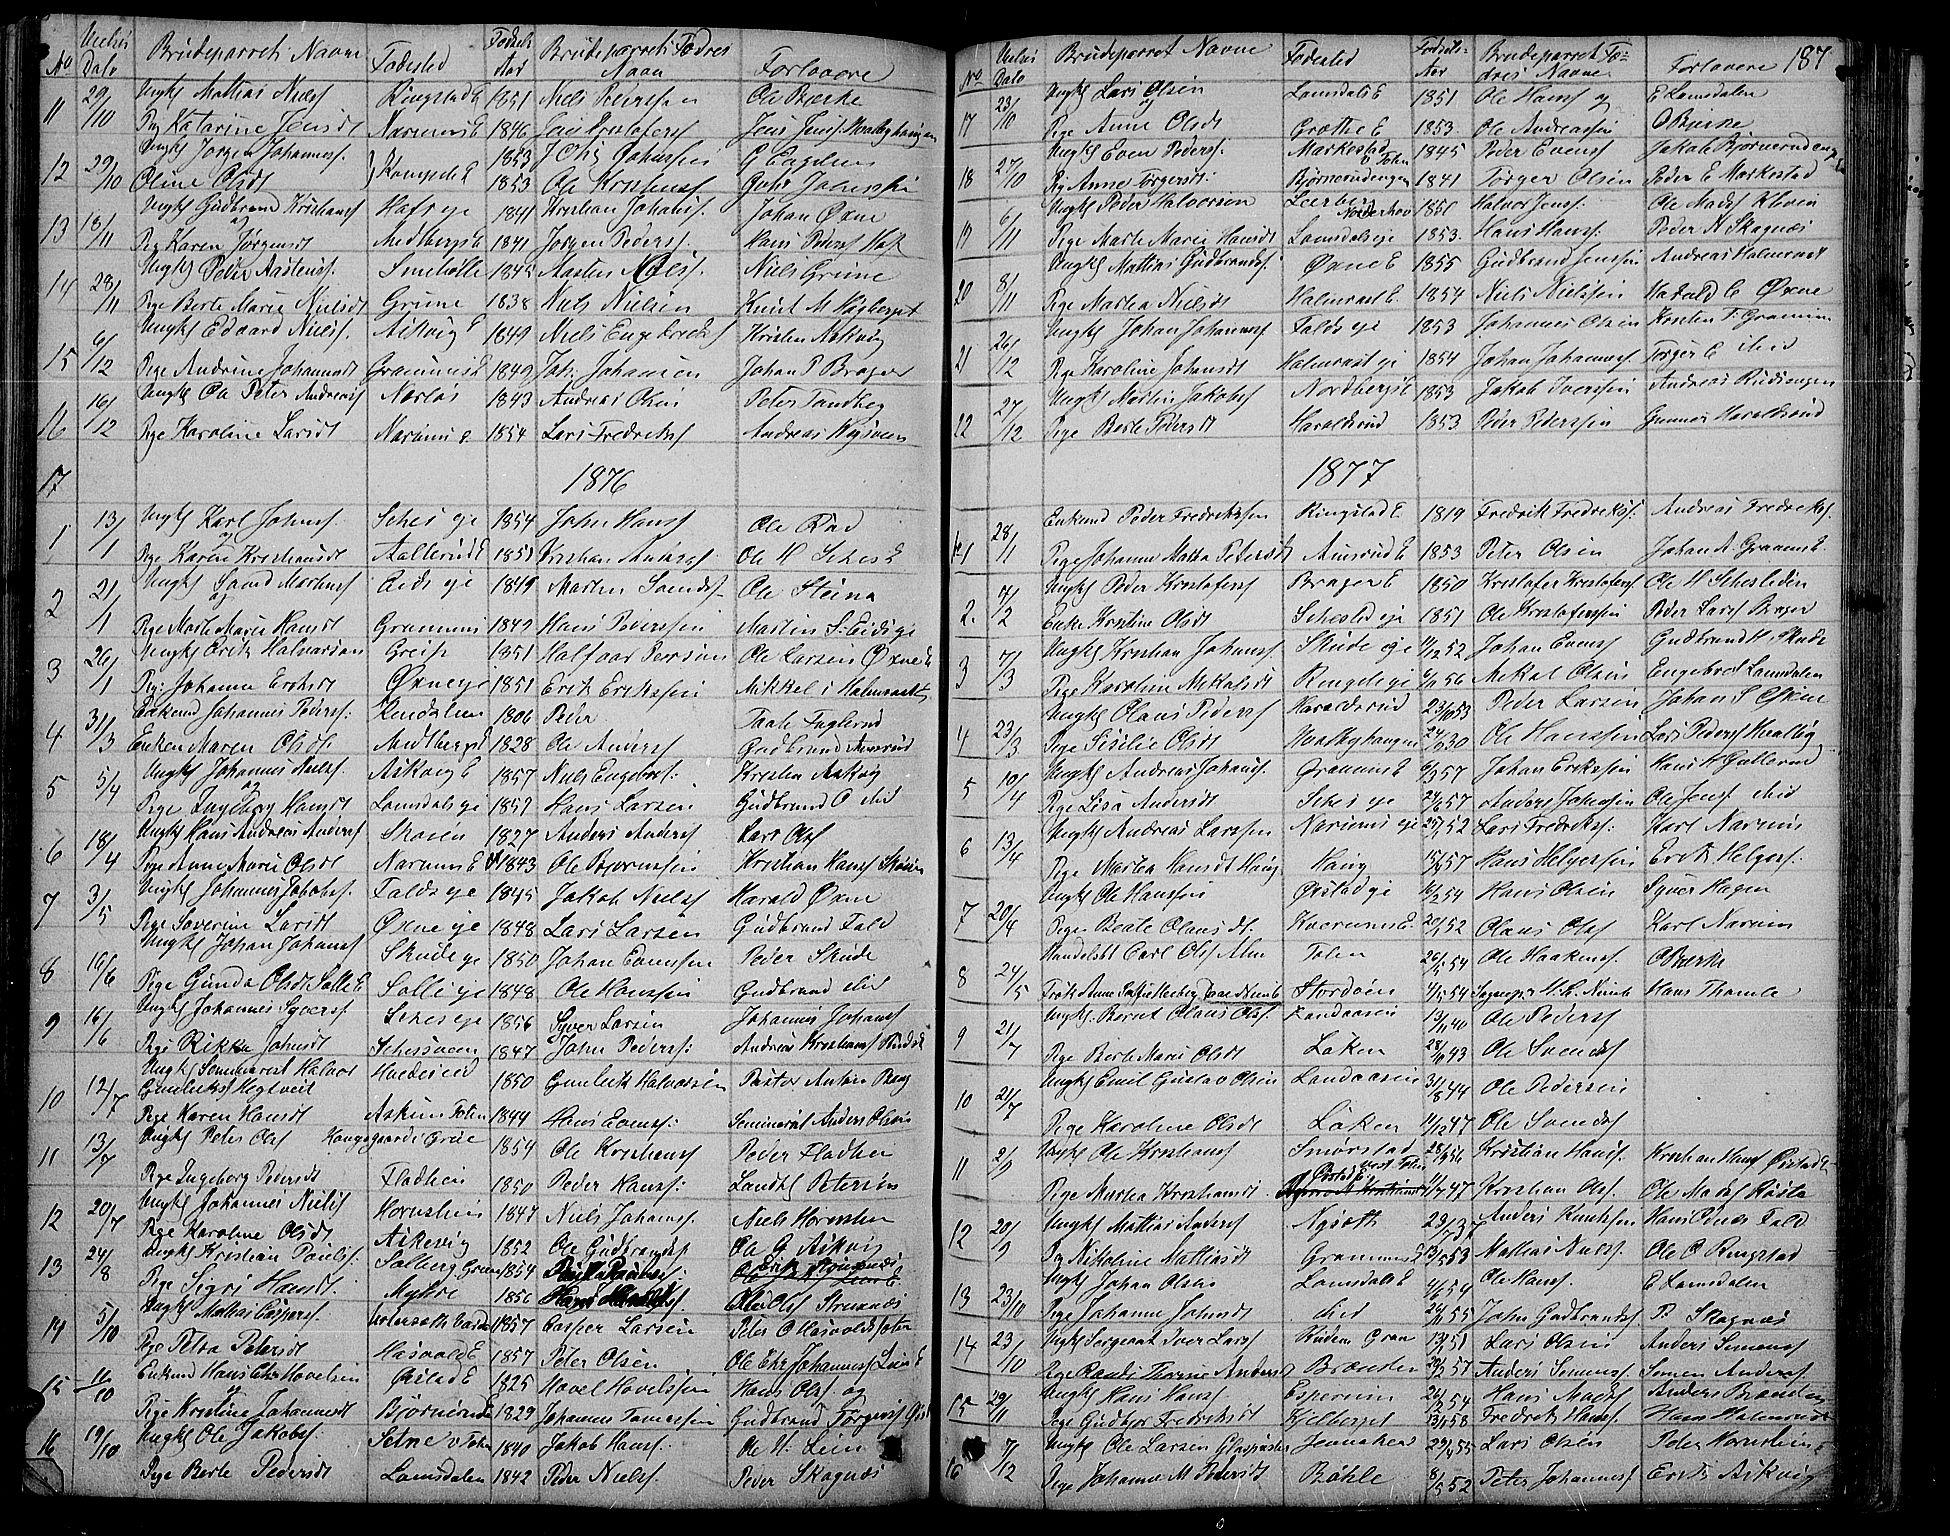 SAH, Søndre Land prestekontor, L/L0001: Klokkerbok nr. 1, 1849-1883, s. 187